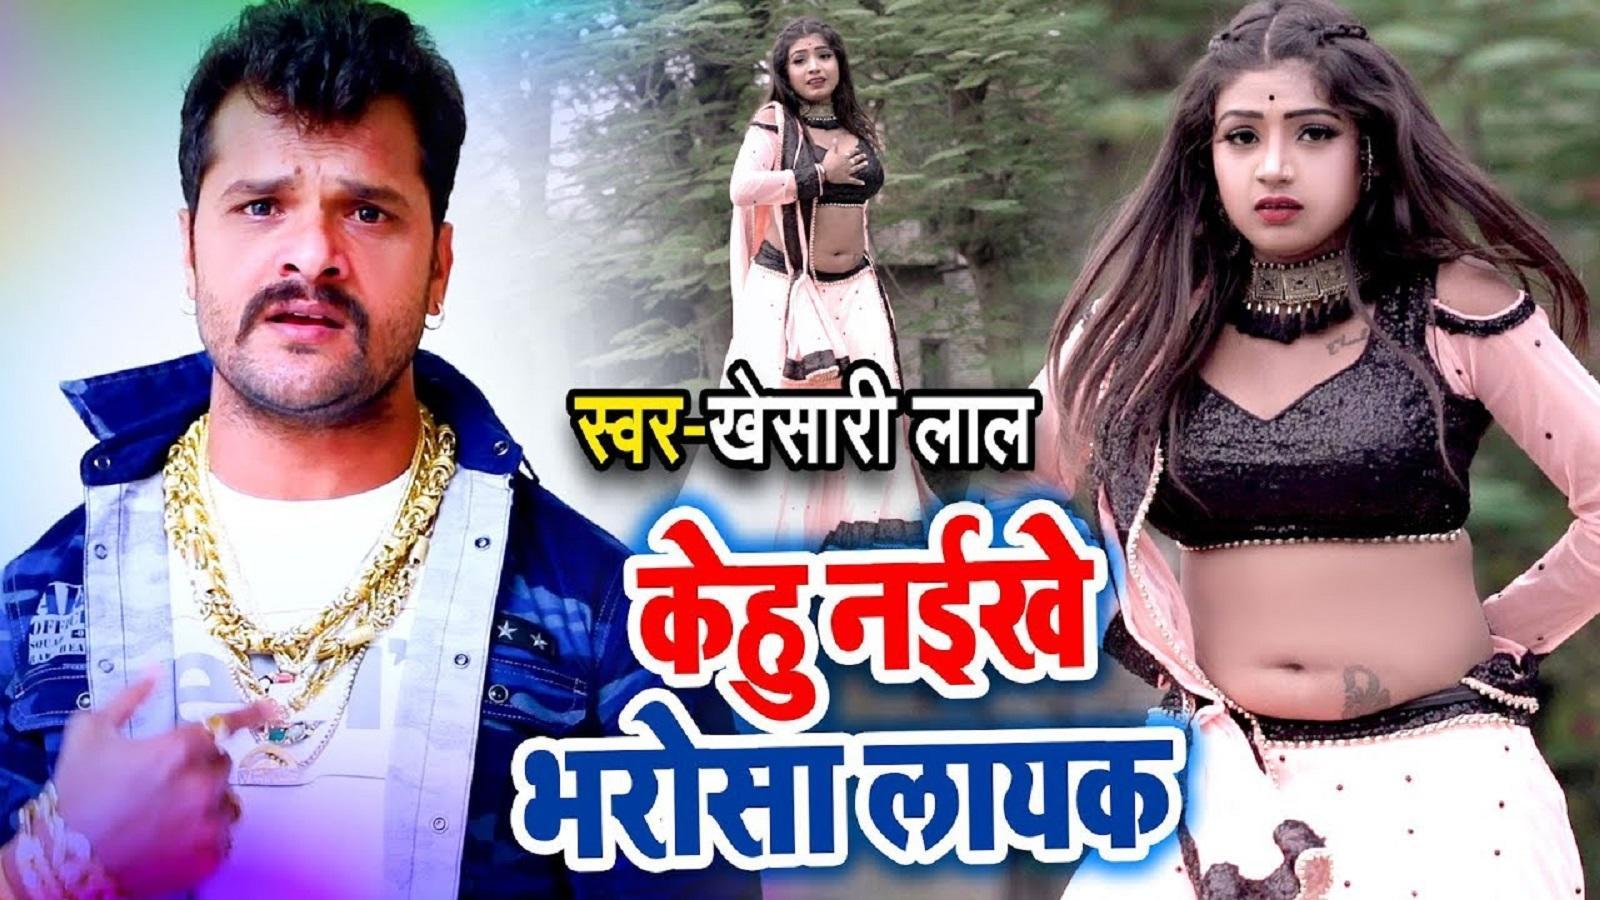 Bhojpuri Gana Video Song 2019: Khesari Lal Yadav Latest Bhojpuri ...